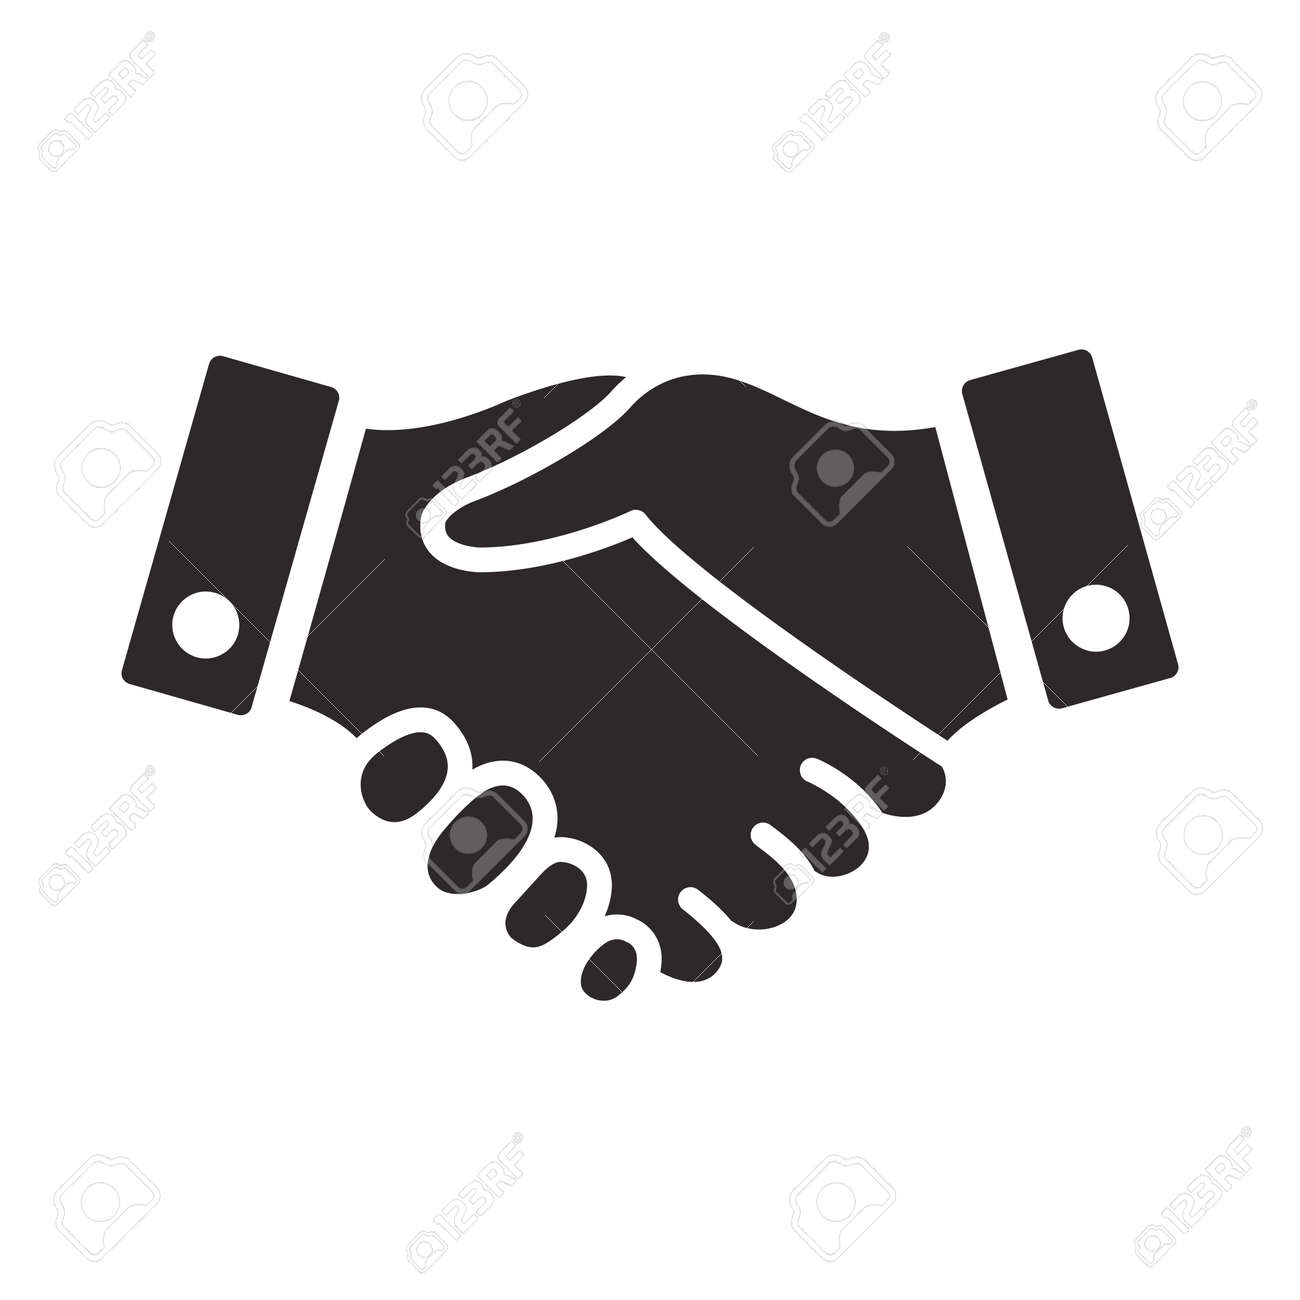 handshake icon vector design illustration - 169839420